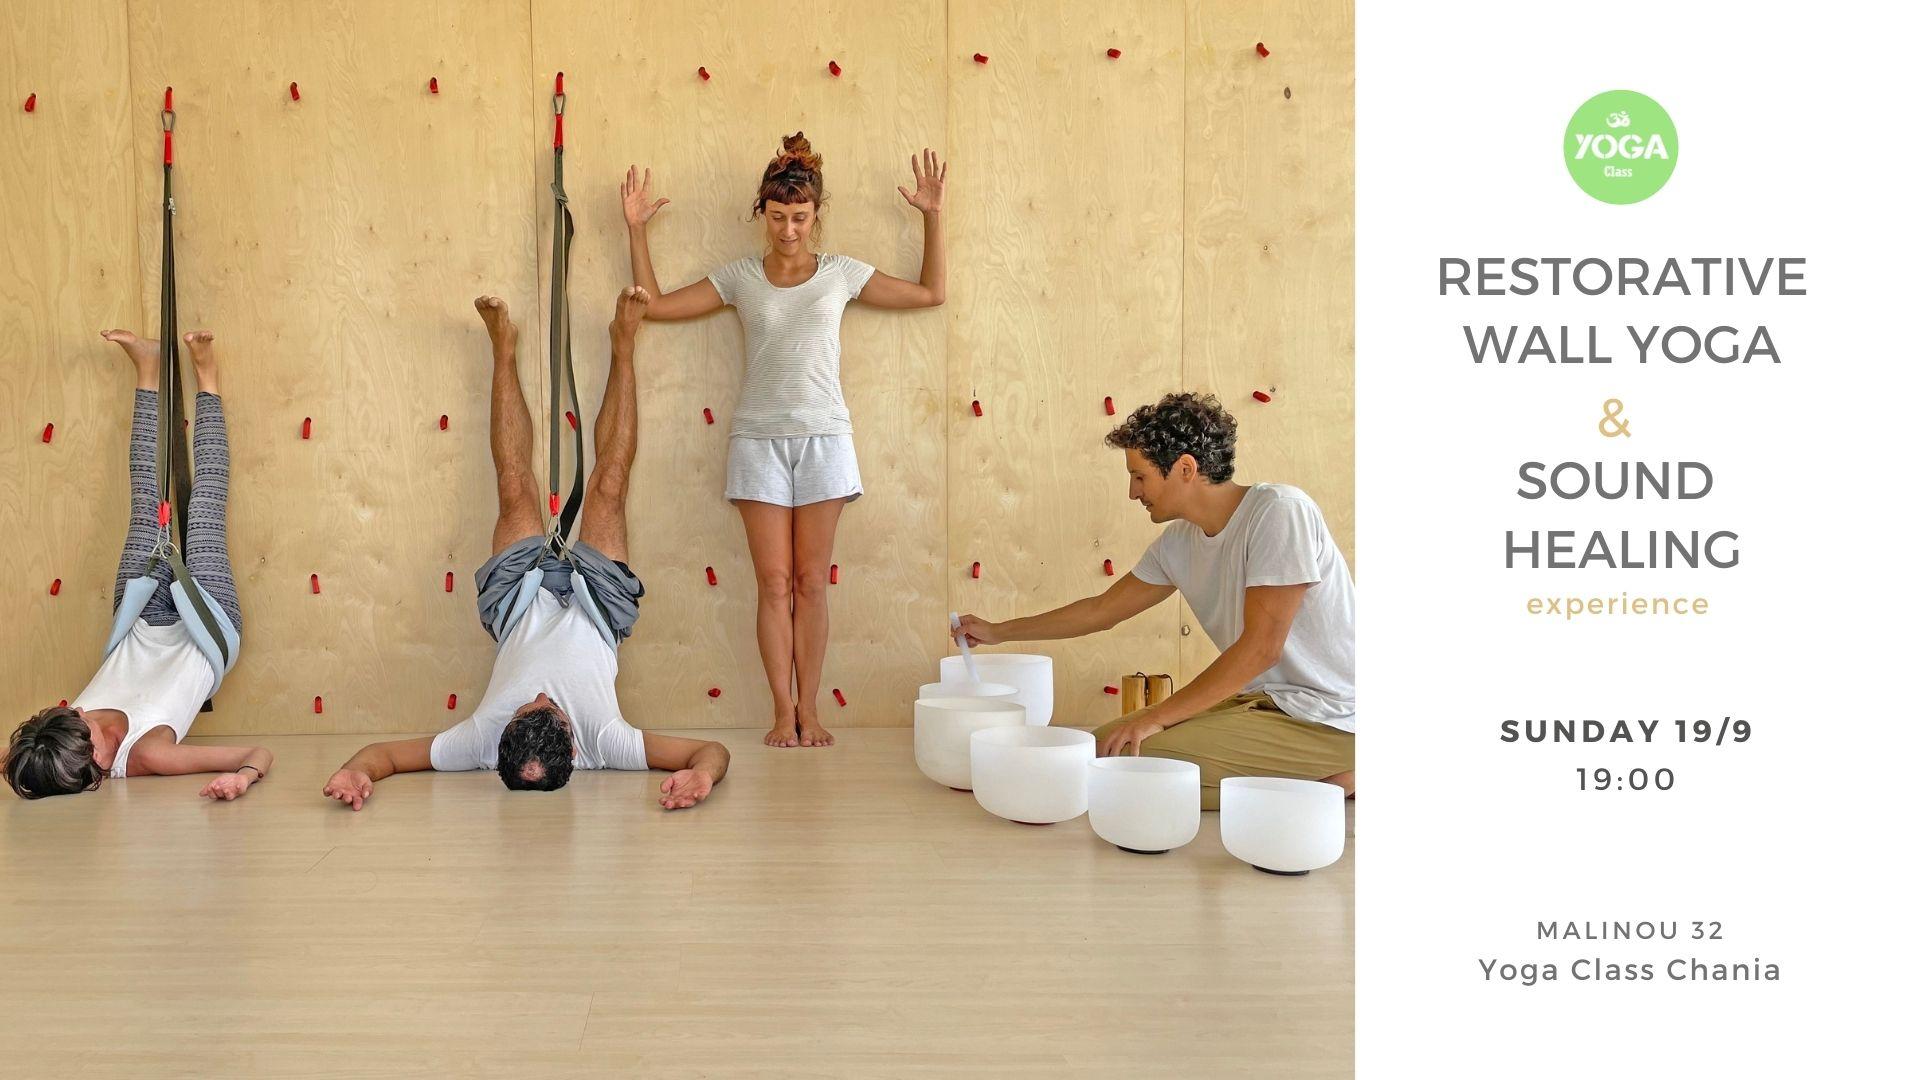 Restorative wall yoga & sound healing experience at Yoga Class Chania – 9 Sept 2021